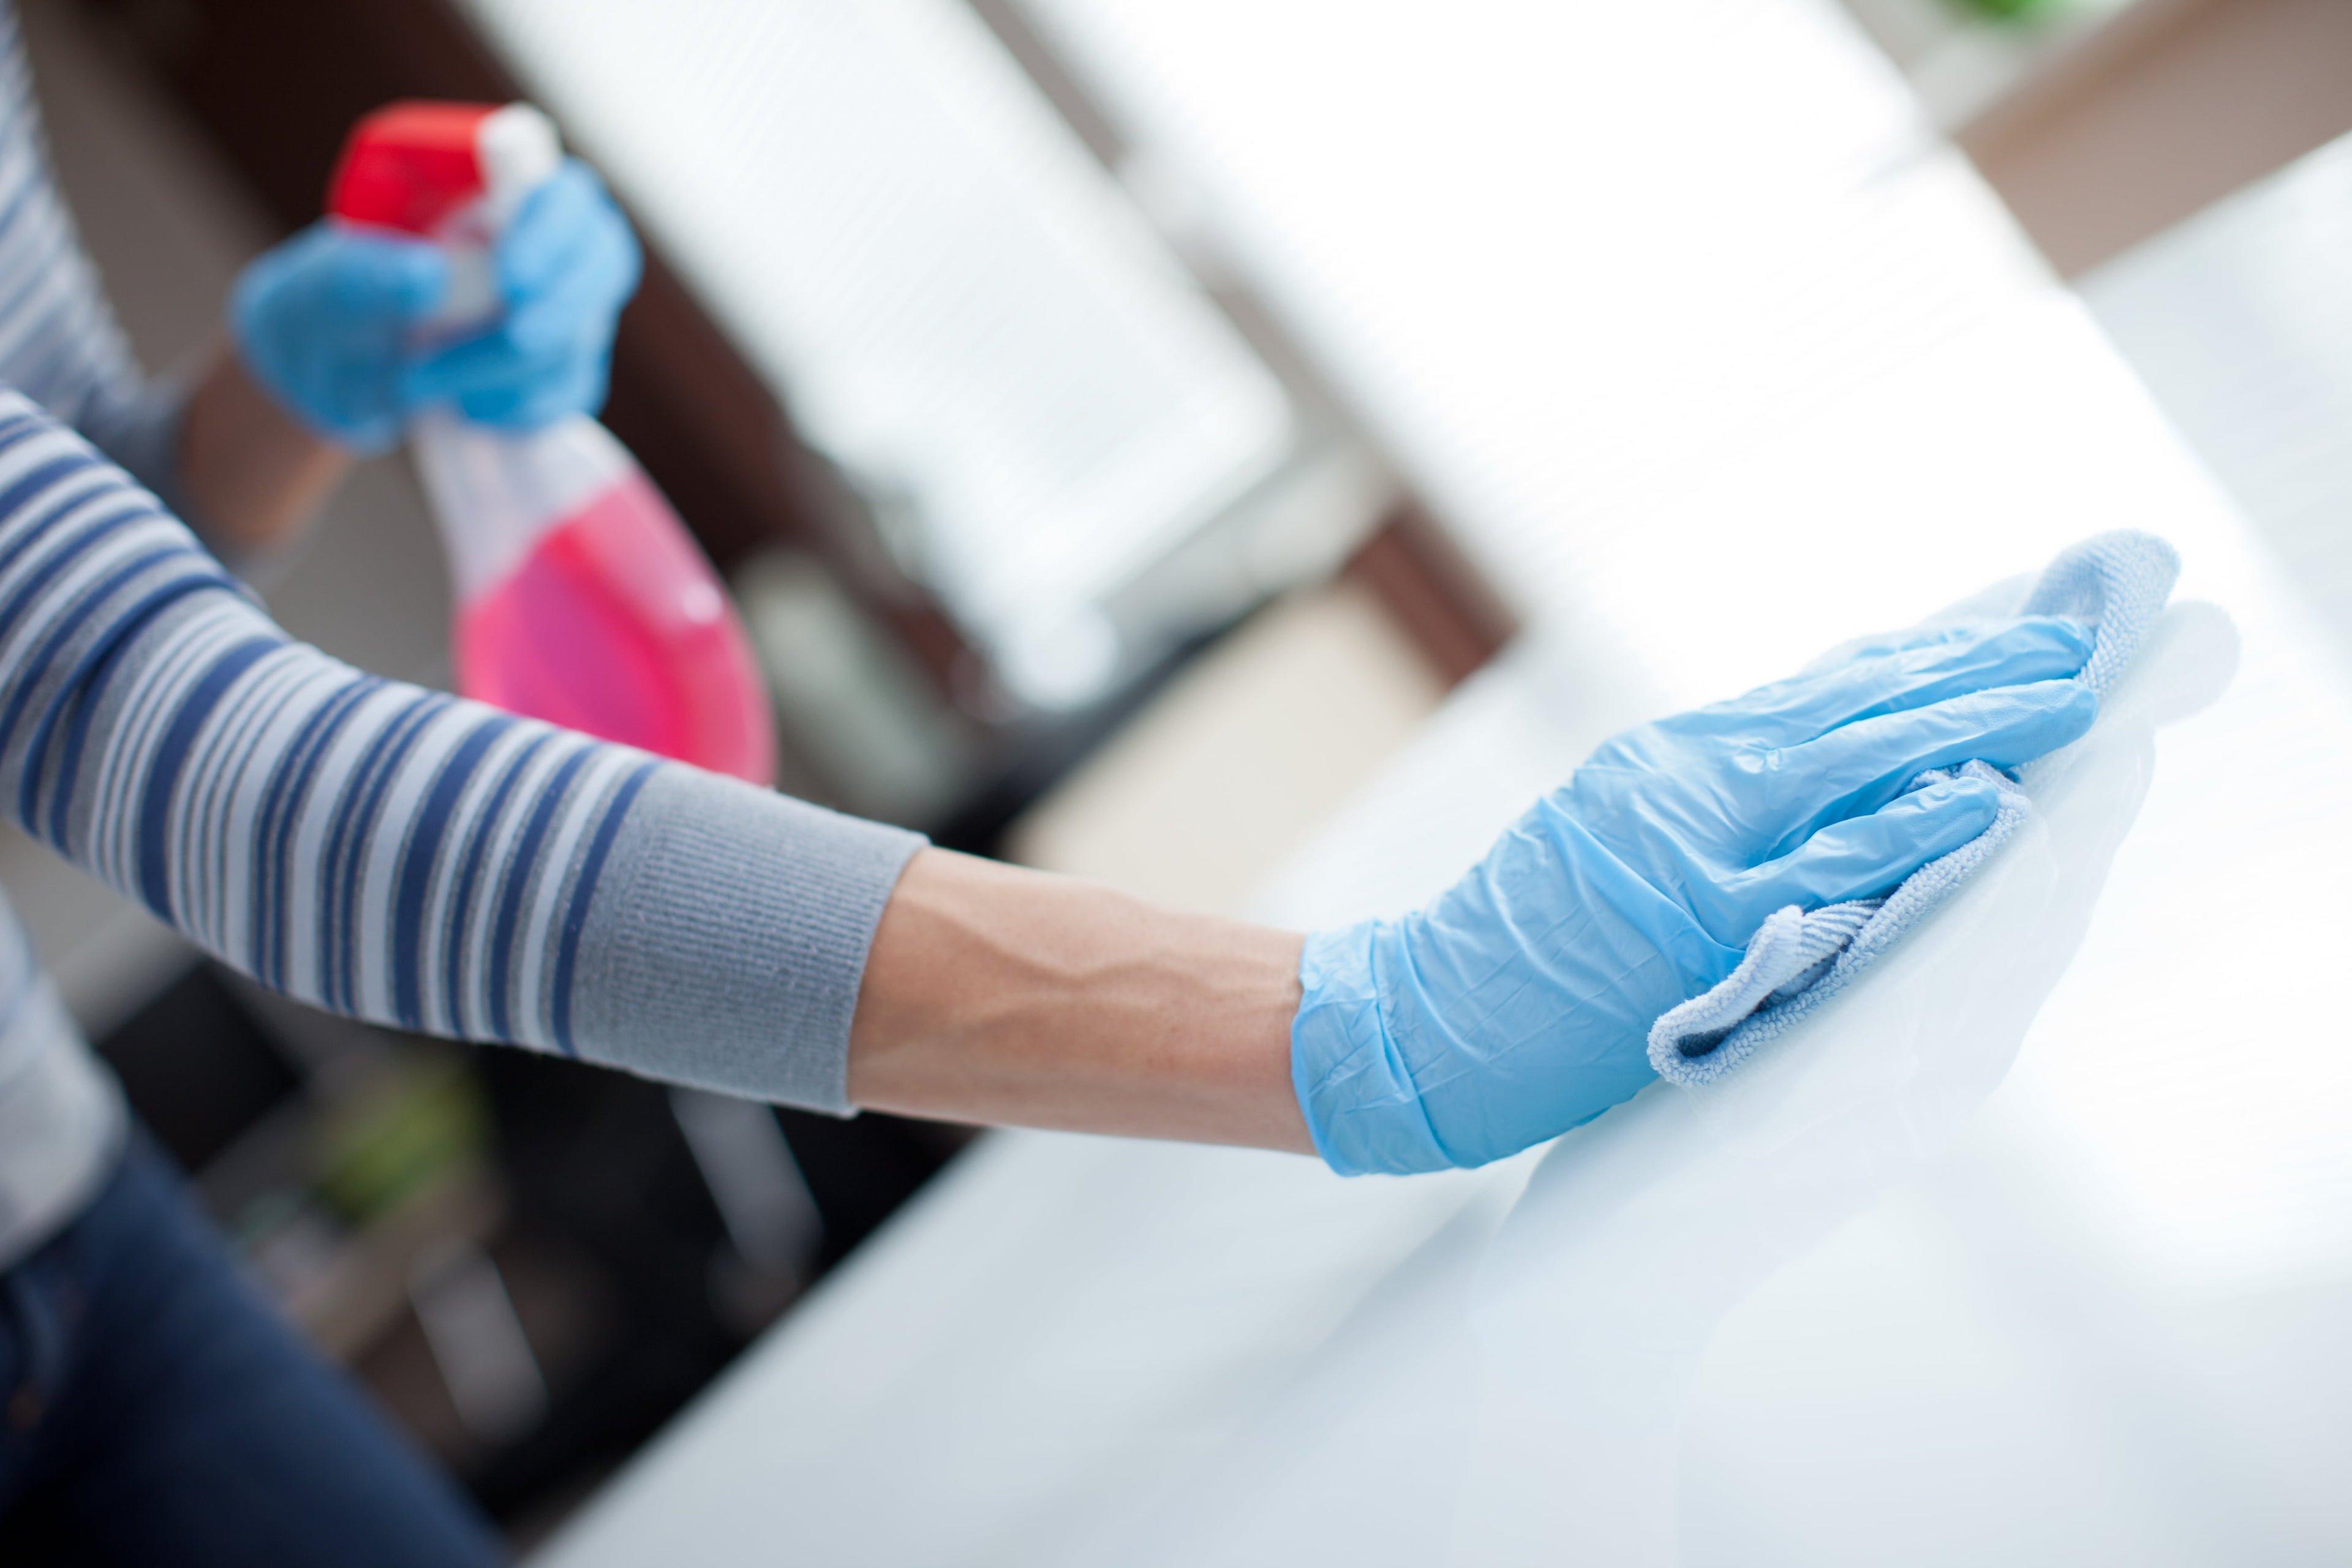 Putzen mit Handschuhen